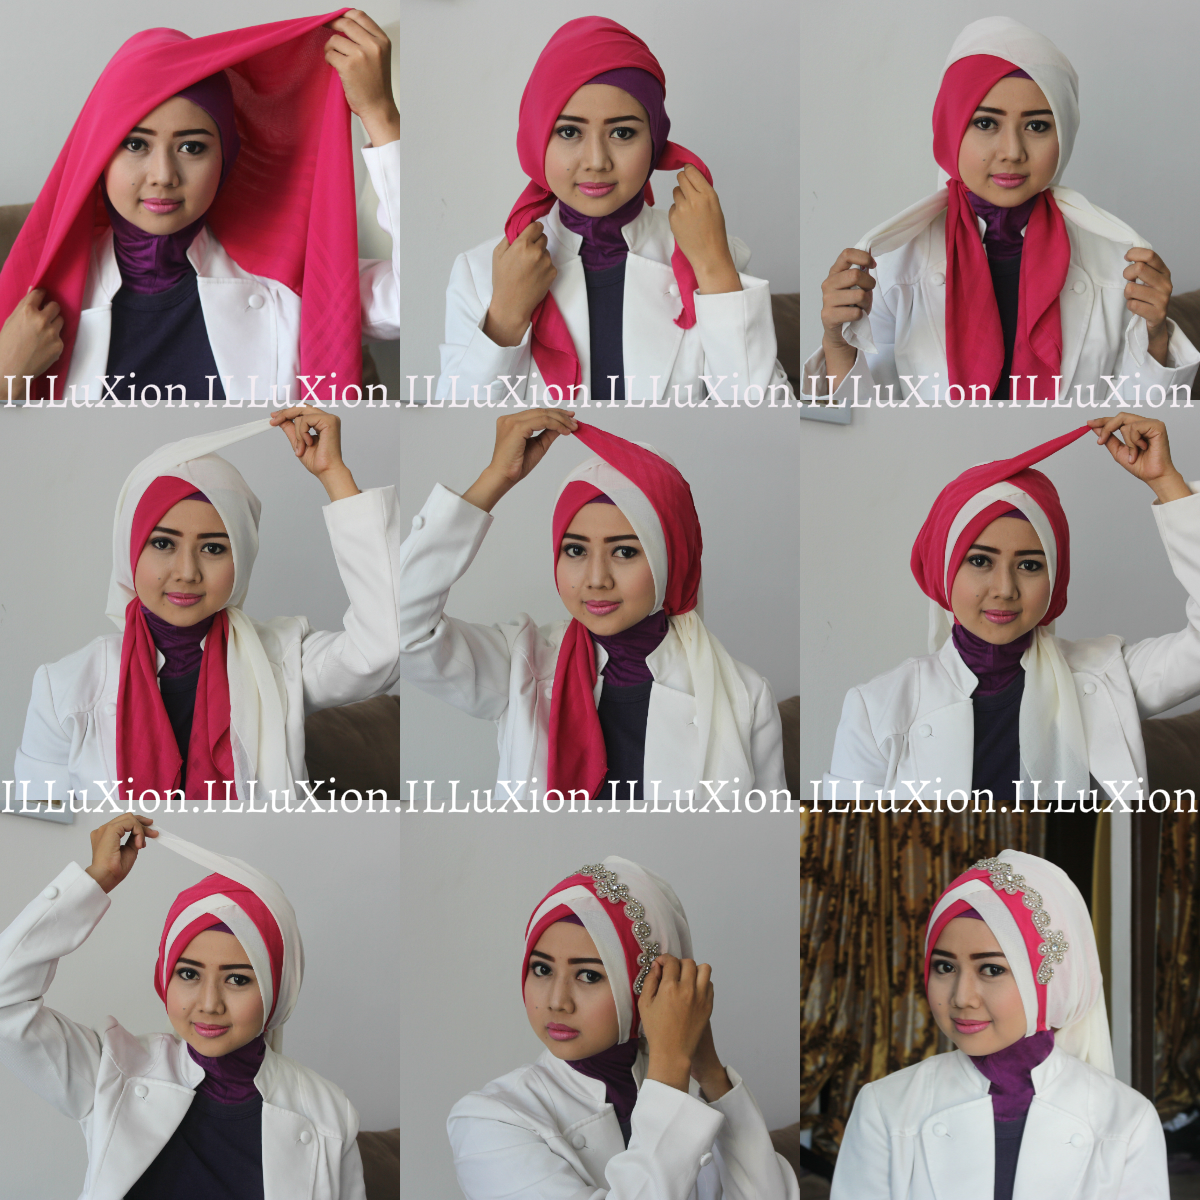 30 Ide Tutorial Hijab Lamaran Terbaru Tutorial Hijab Terbaru Tahun